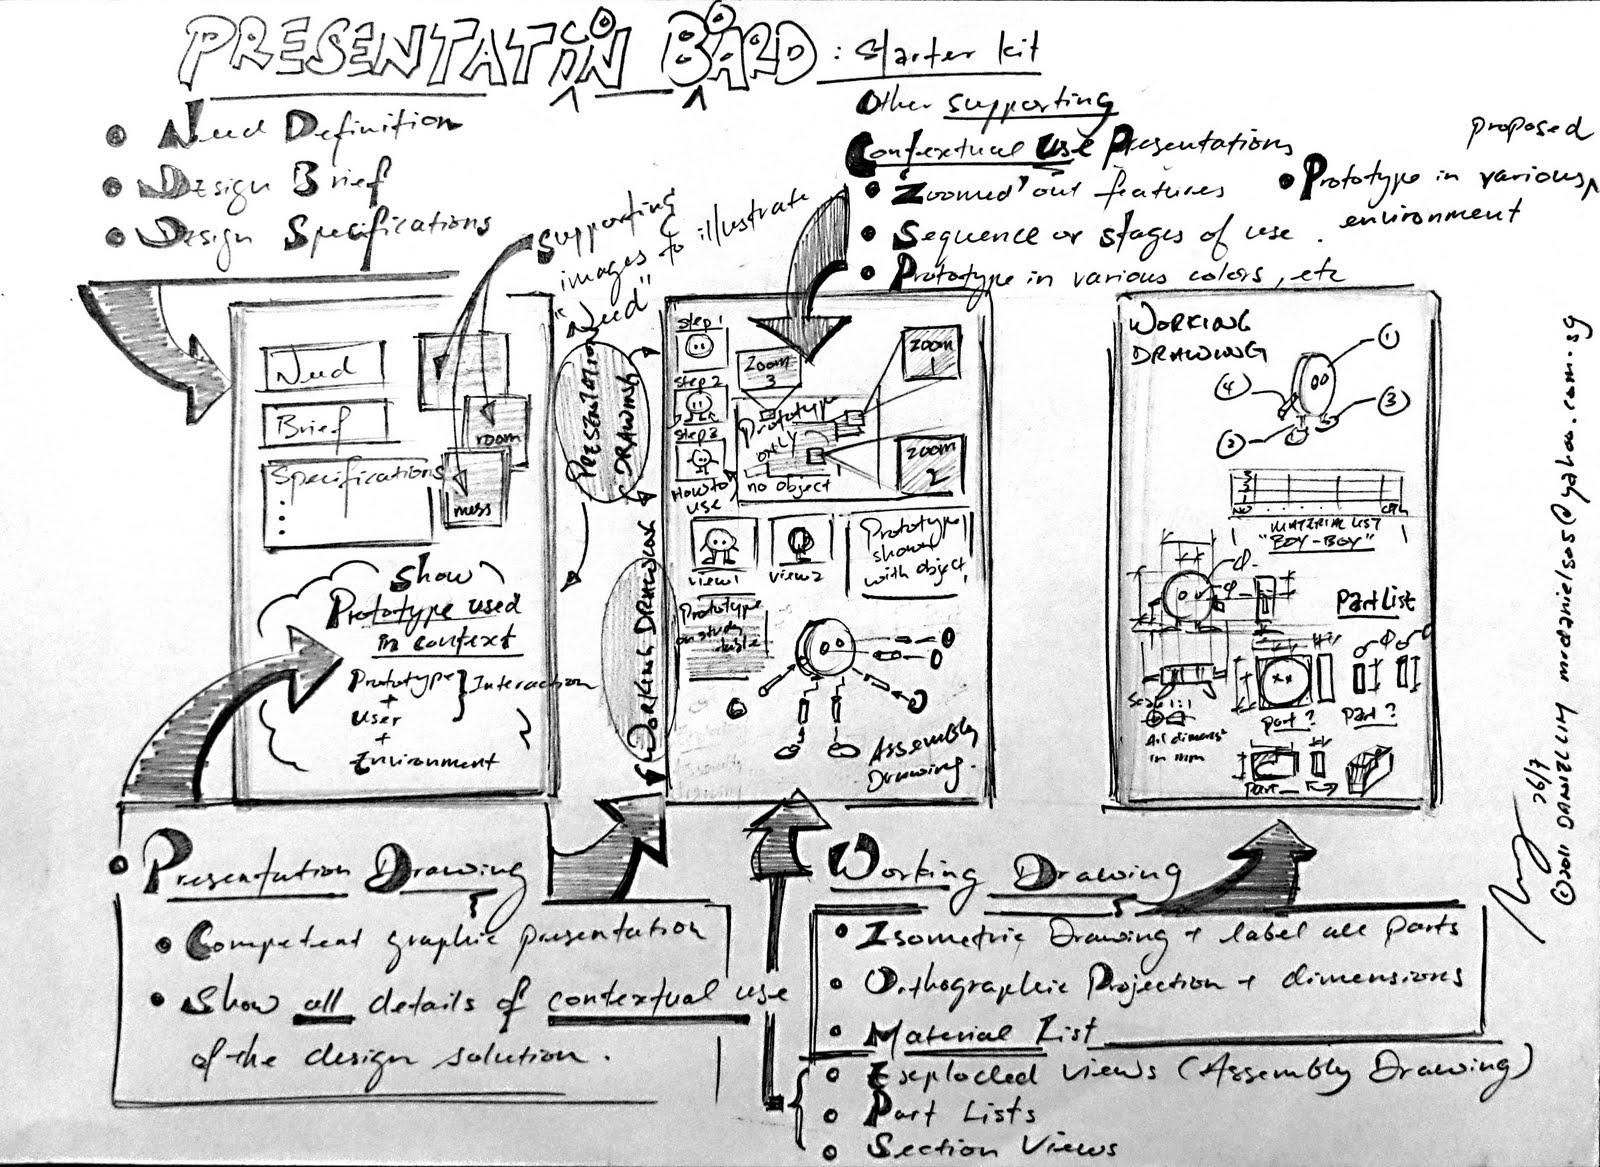 design journal sos presentation board presentation drawing